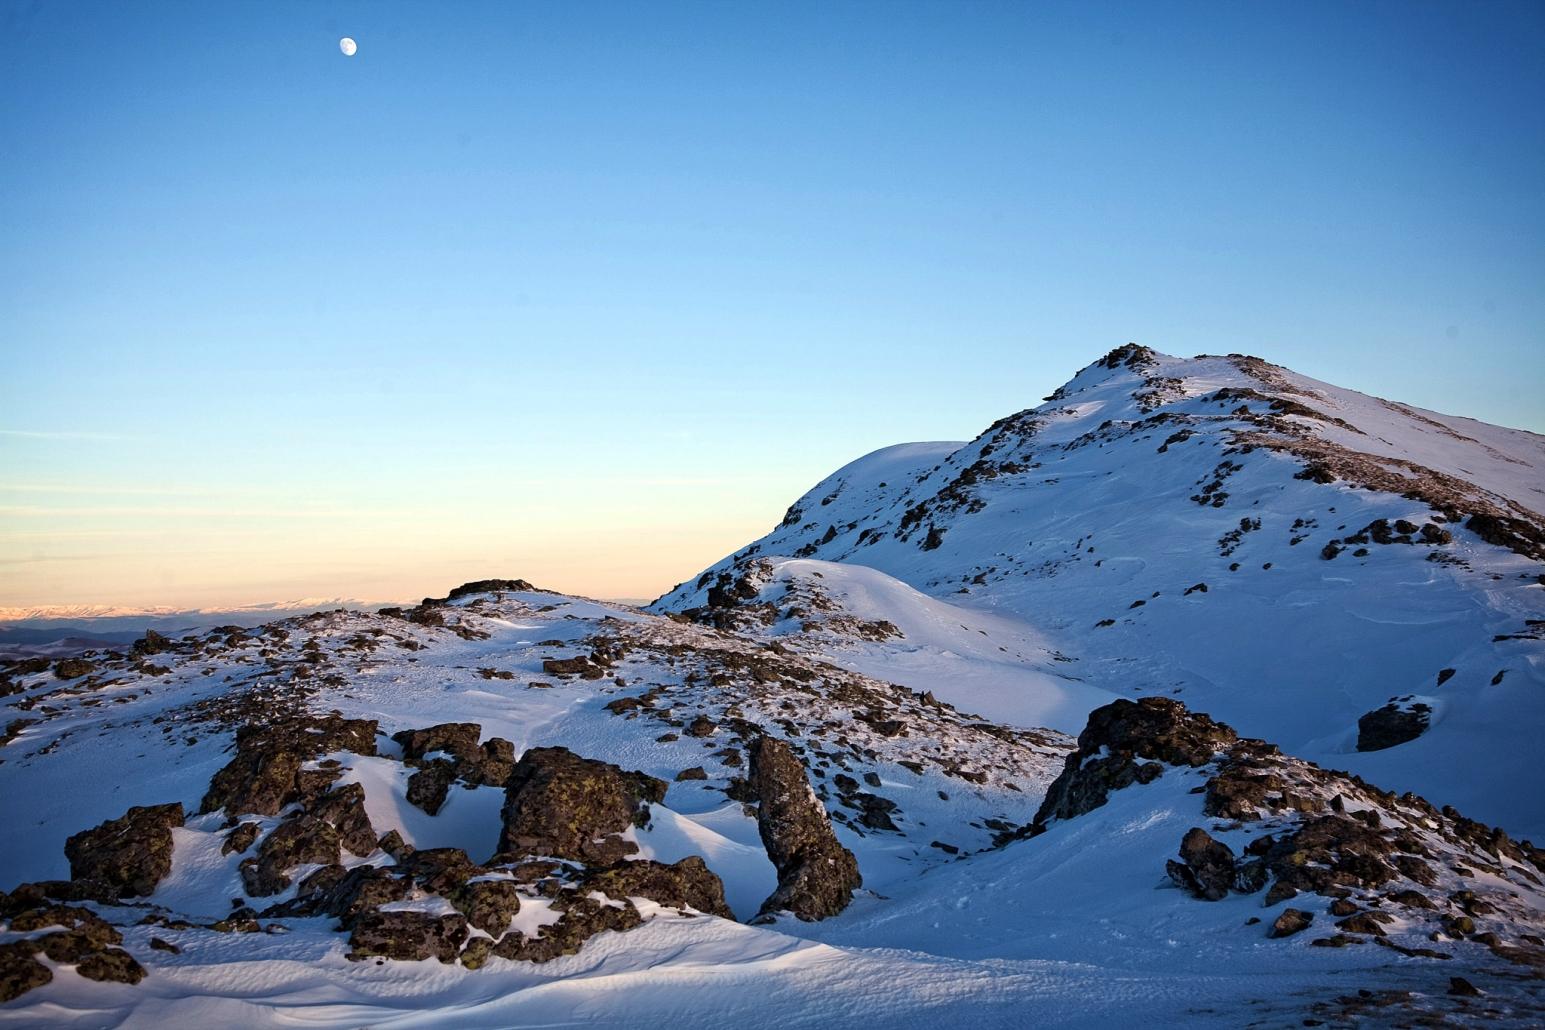 Peisaj montan, iarna in Parâng